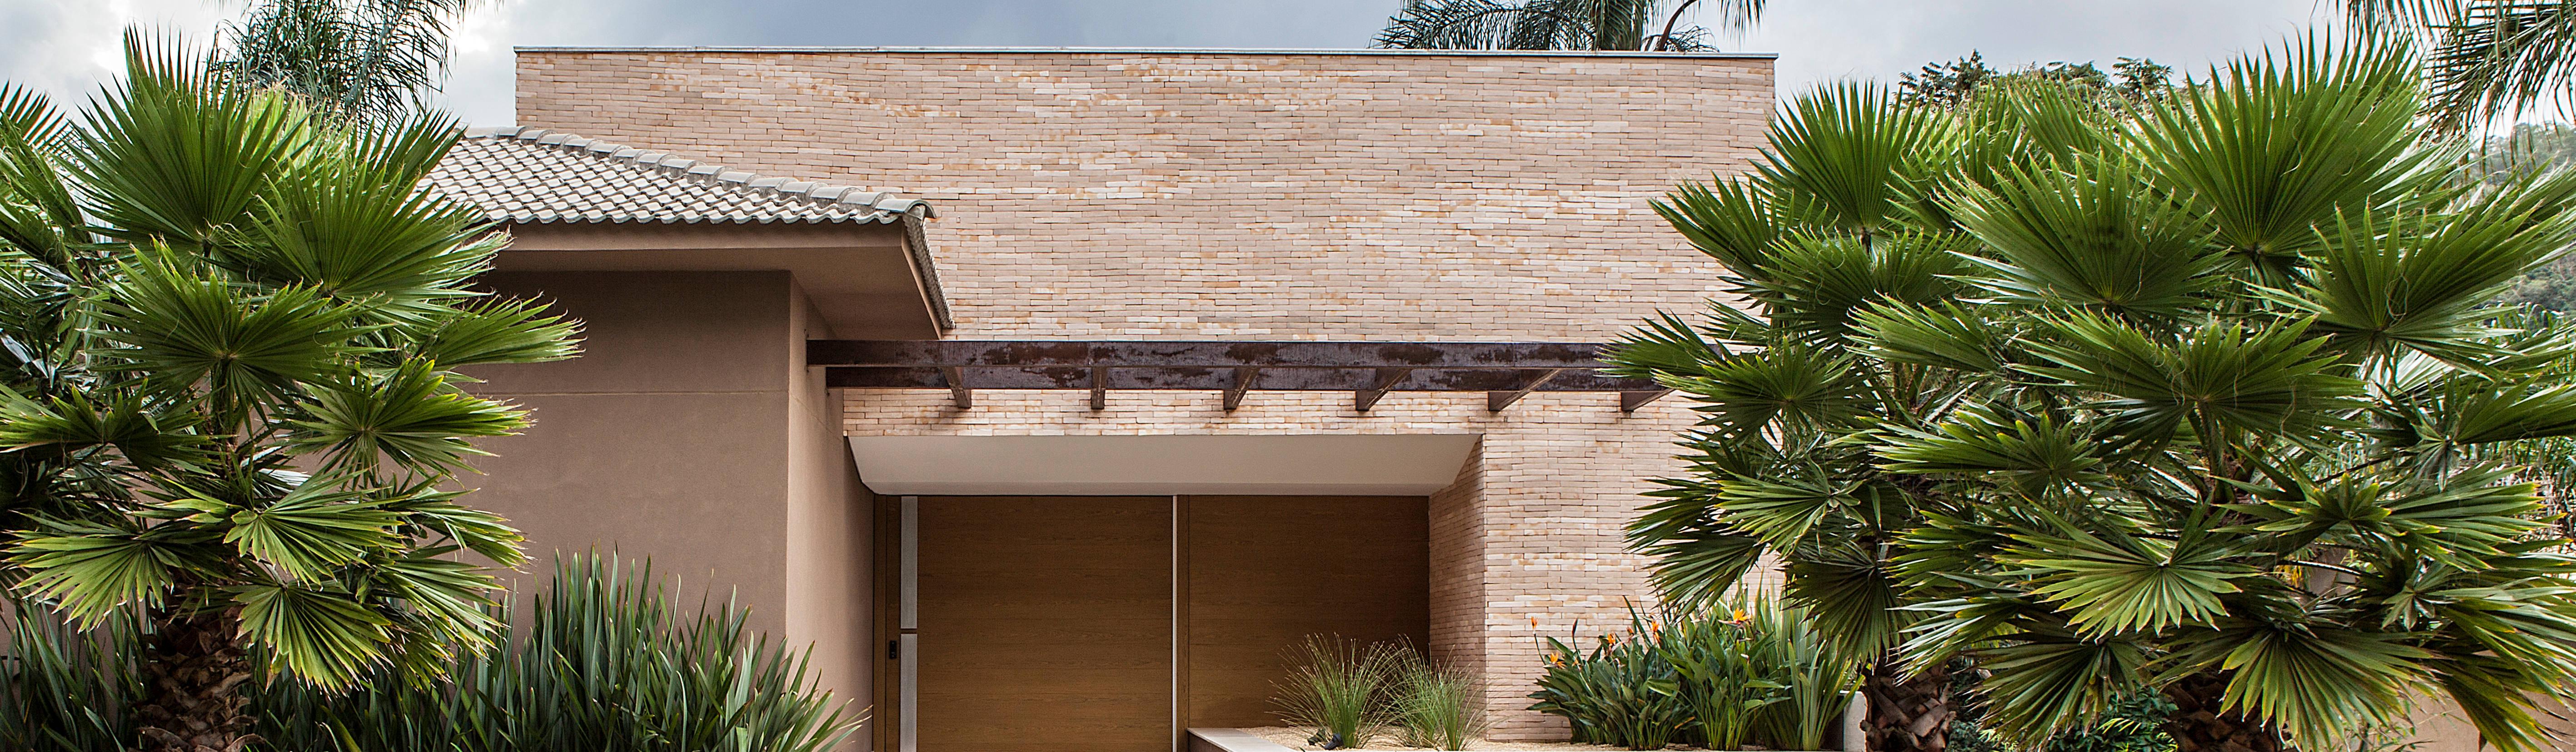 Márcia Carvalhaes Arquitetura LTDA.